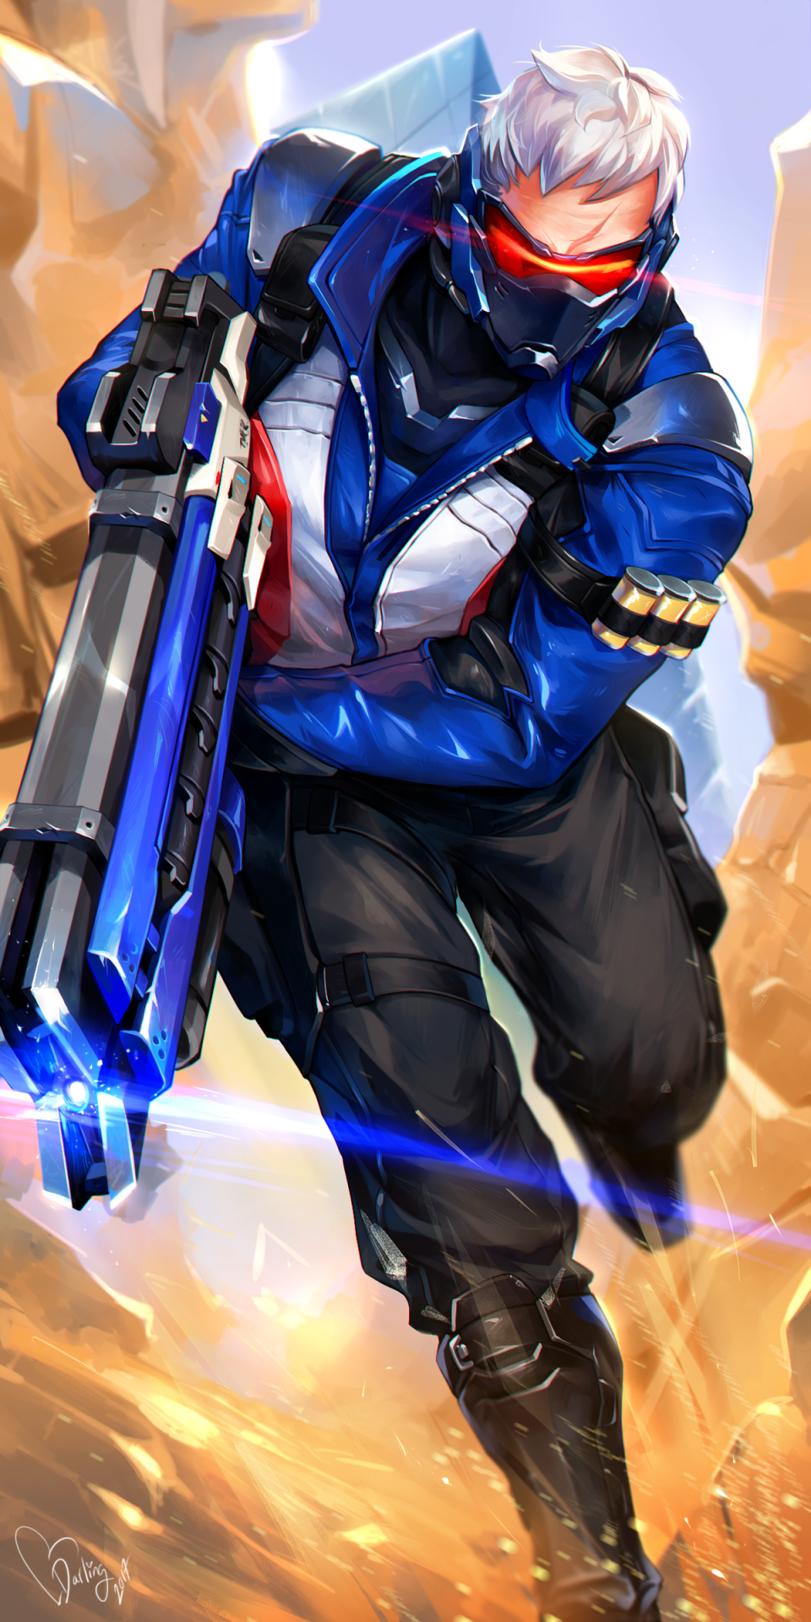 Soldier 76 Overwatch Blizzard Blizzard Entertainment Fendomy Overwatch Art Dataglitch Igrovye Arty Komiksy Soldat